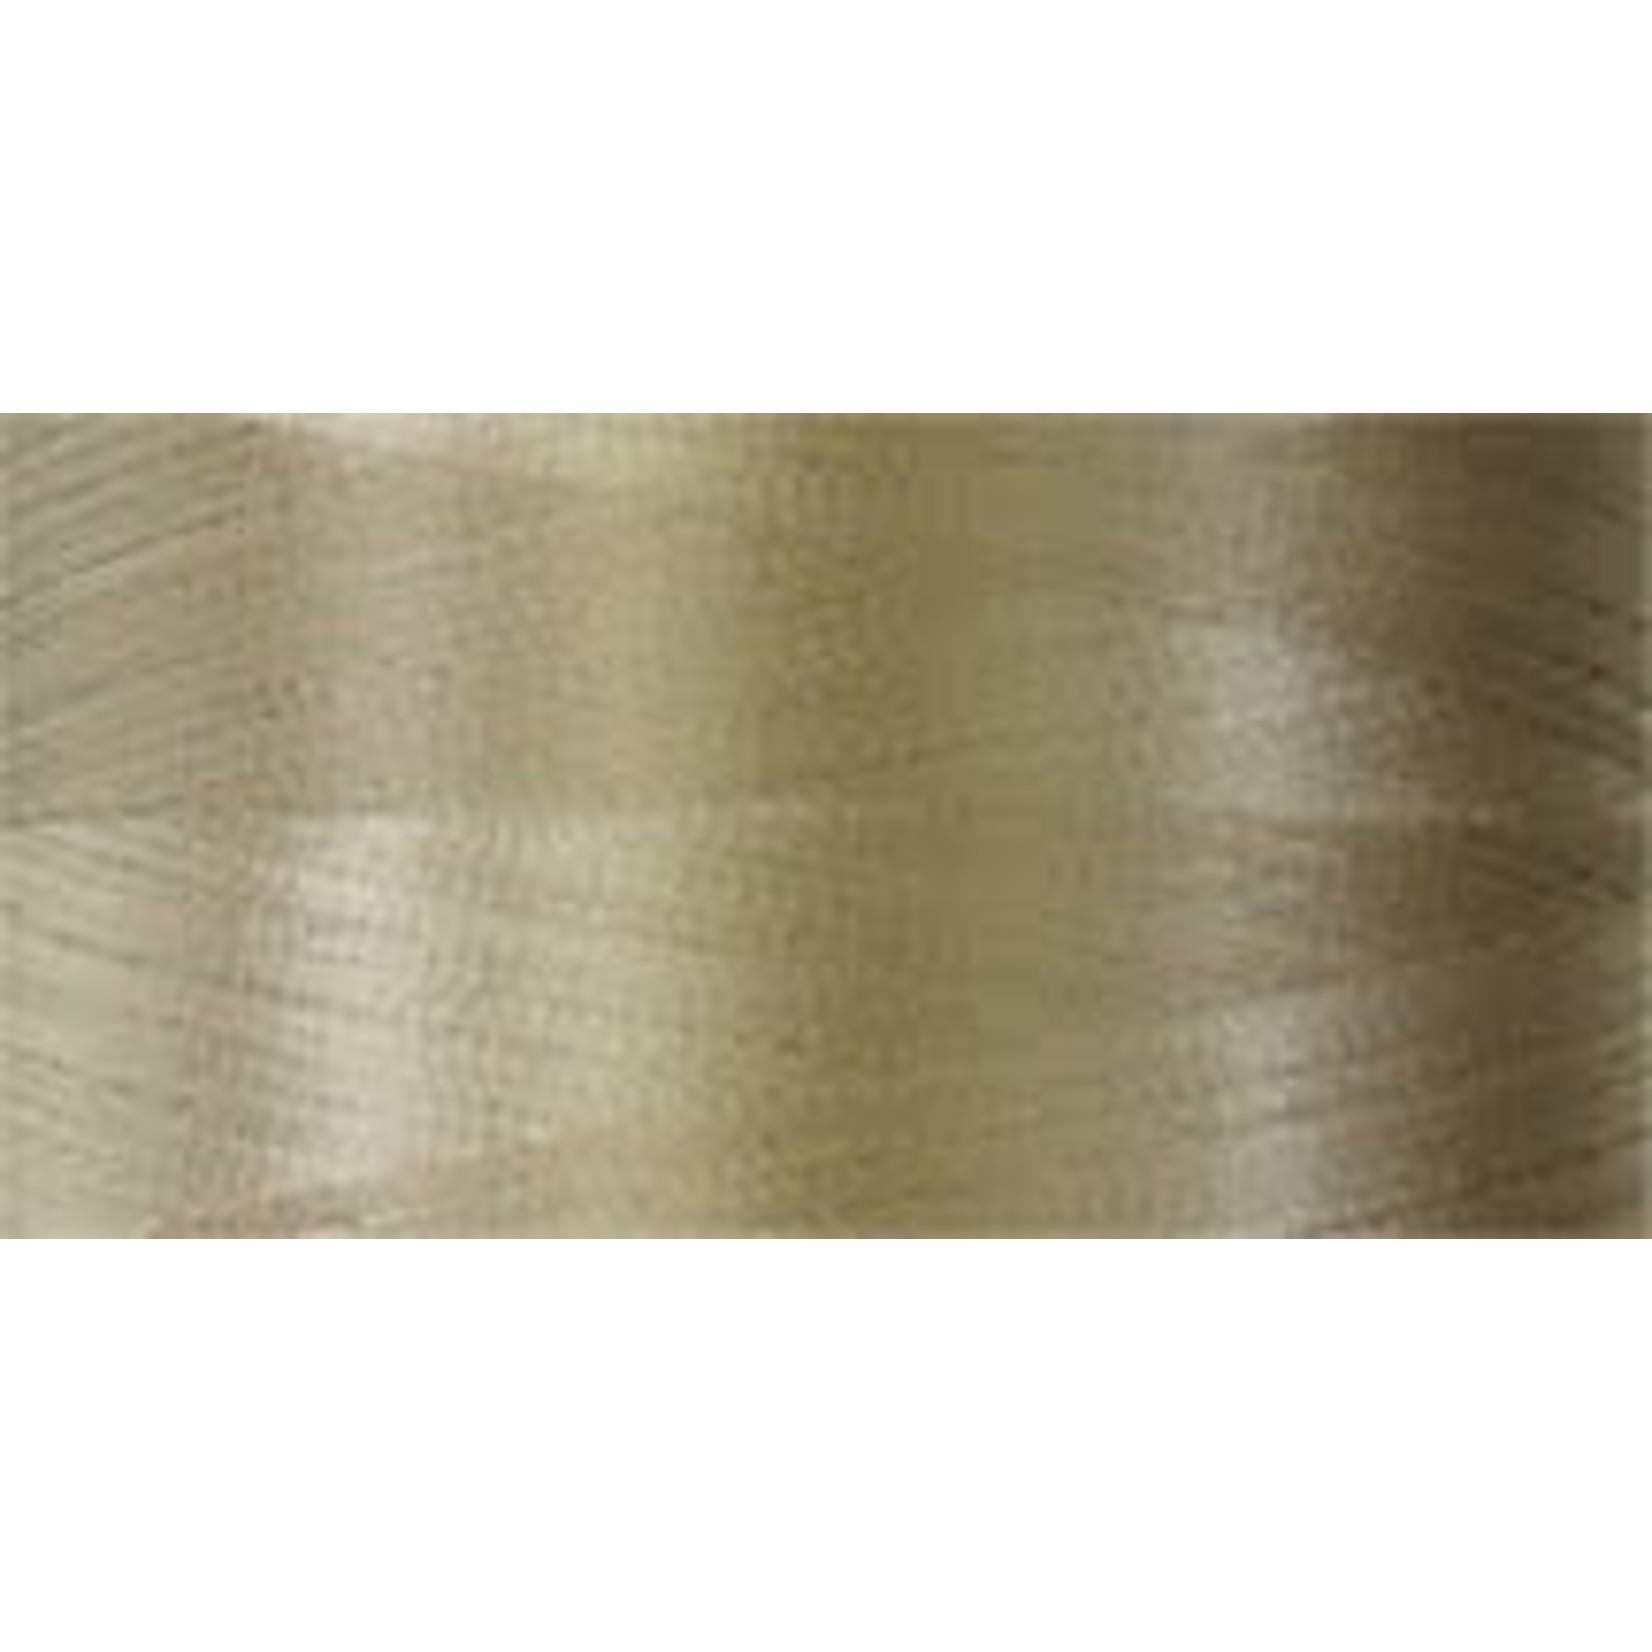 Superior Threads Bottom Line - #60 - 1300 m - 617 Taupe